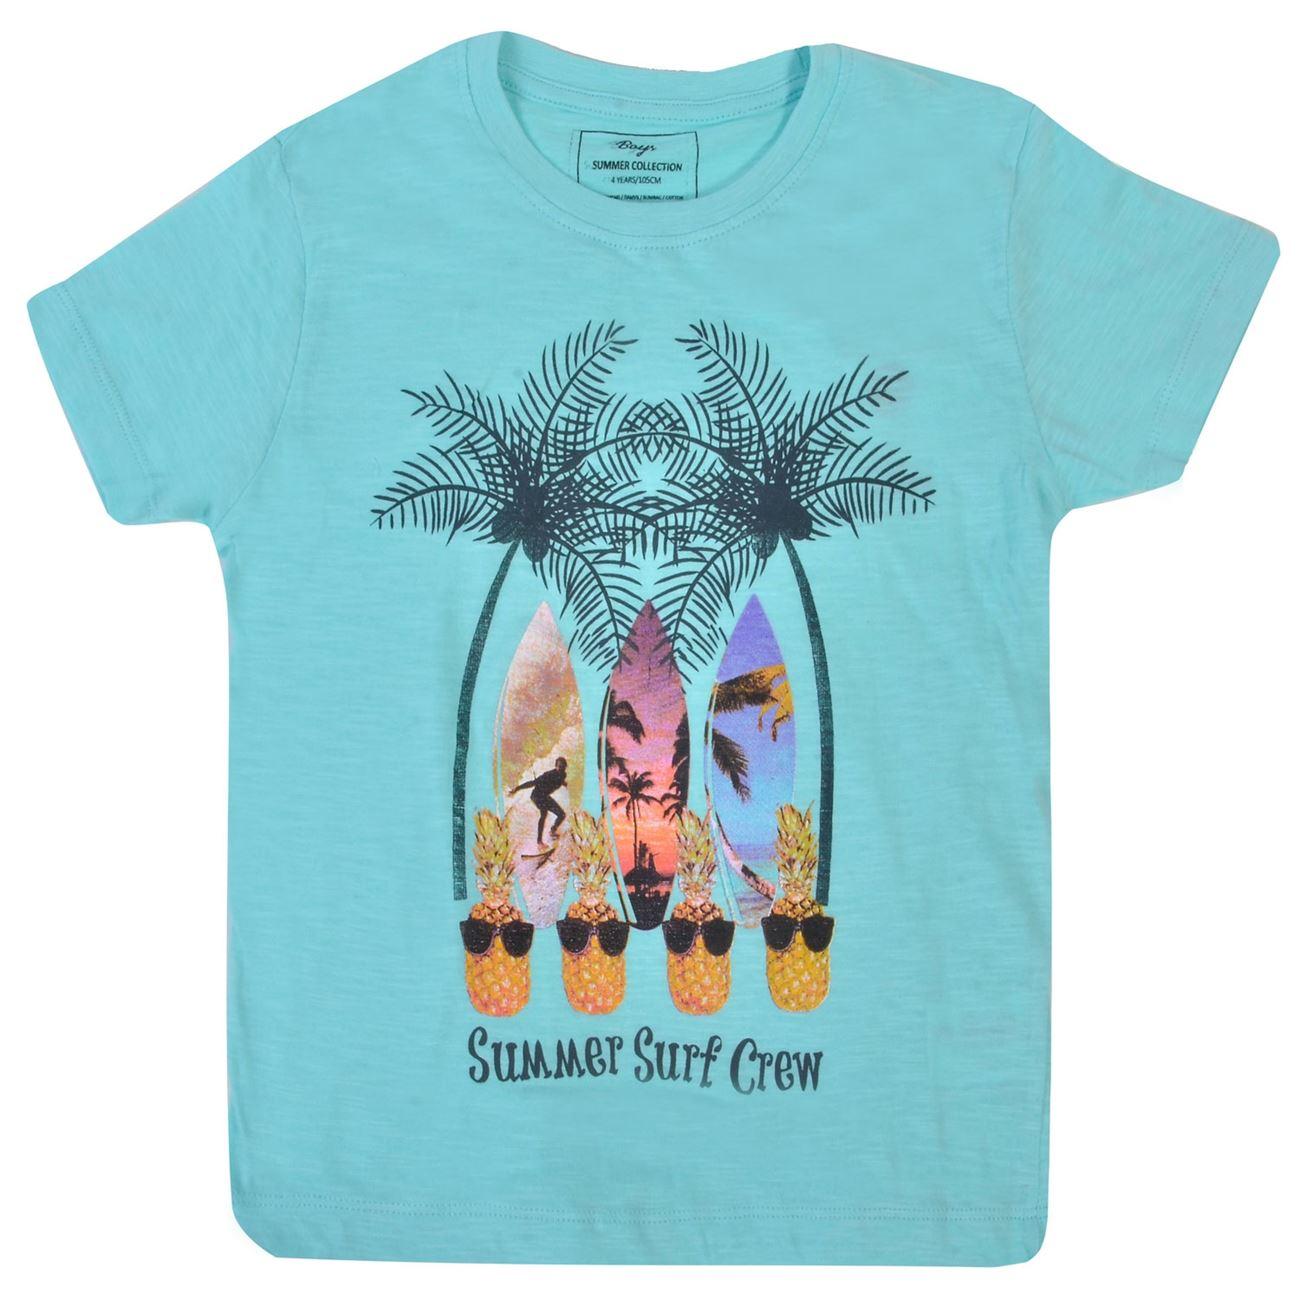 fcfc4aef773d Μπλουζάκι Κοντομάνικο Παιδικό Ανανάς Surf   Κοντομάνικες Μπλούζες για  Αγόρια 4-6 Ετών